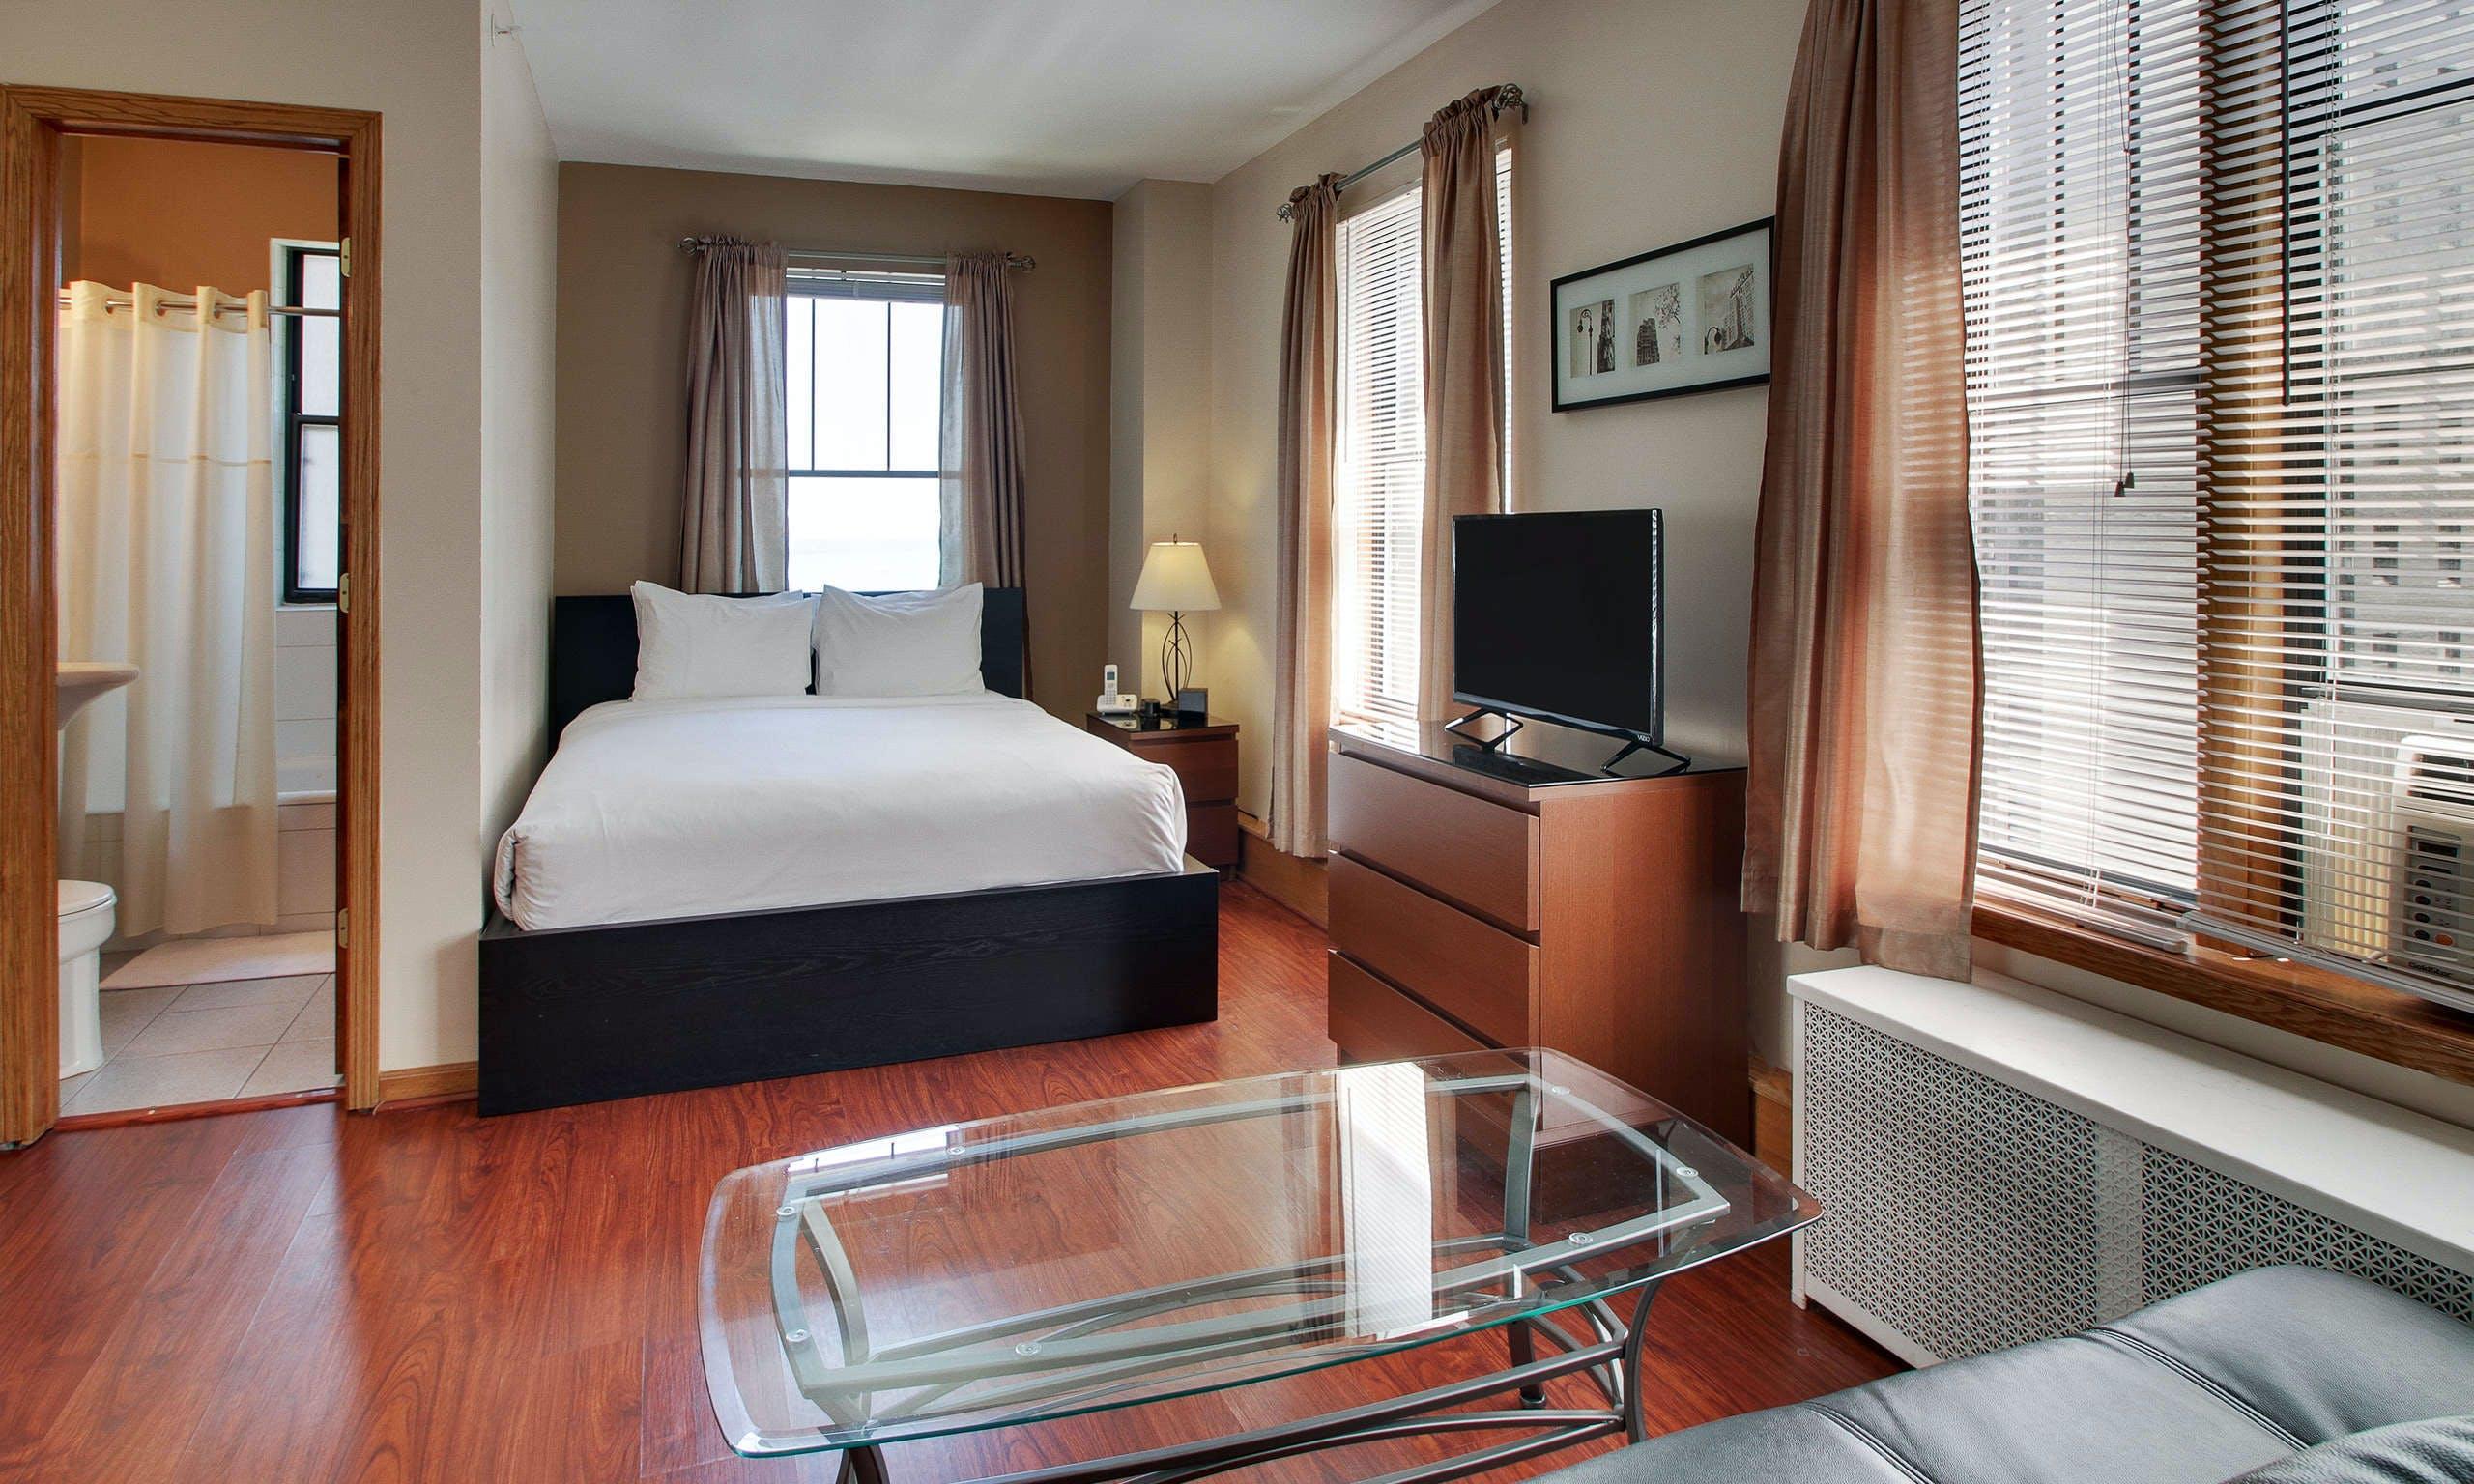 DeWitt Hotel & Suites